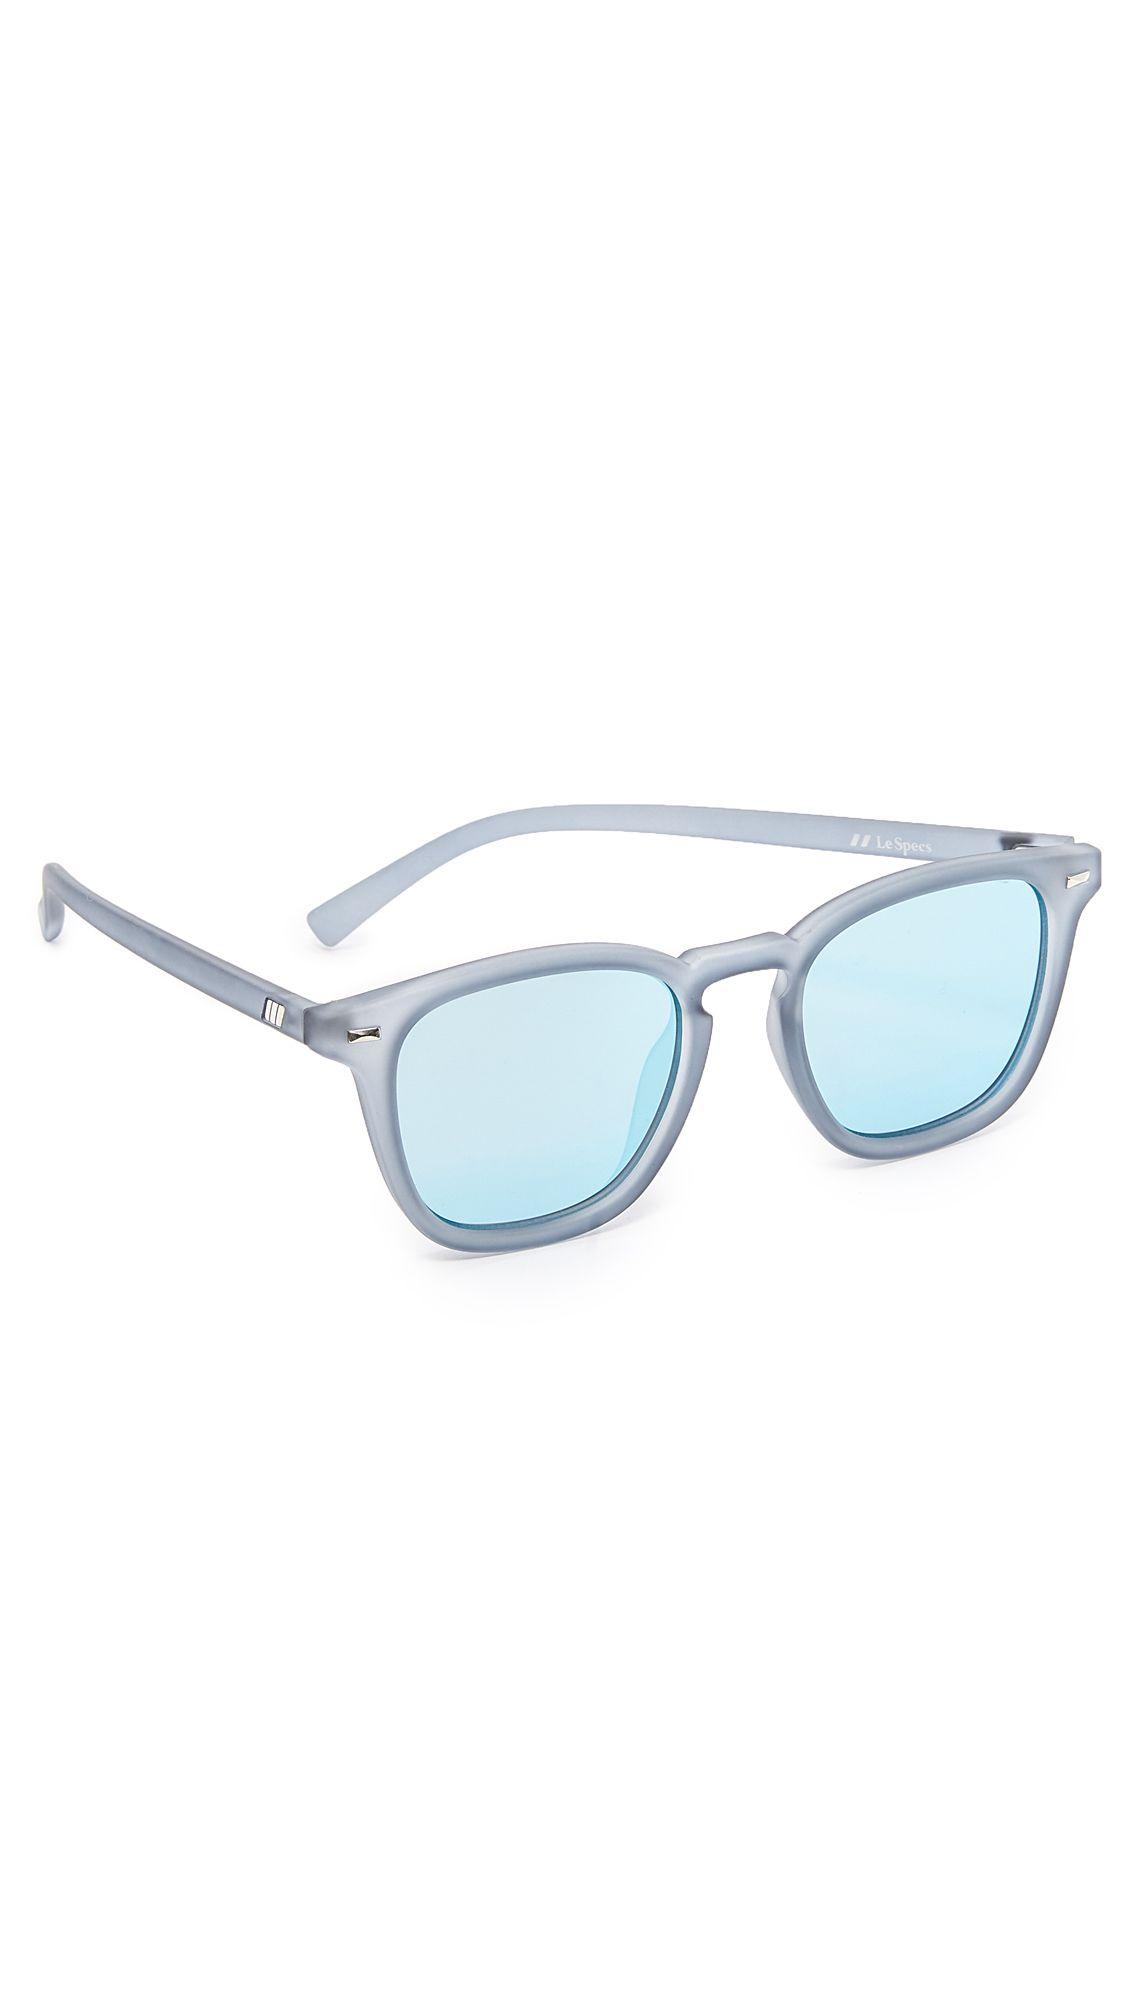 ee175dadfa3 LE SPECS No Biggie Sunglasses.  lespecs  sunglasses